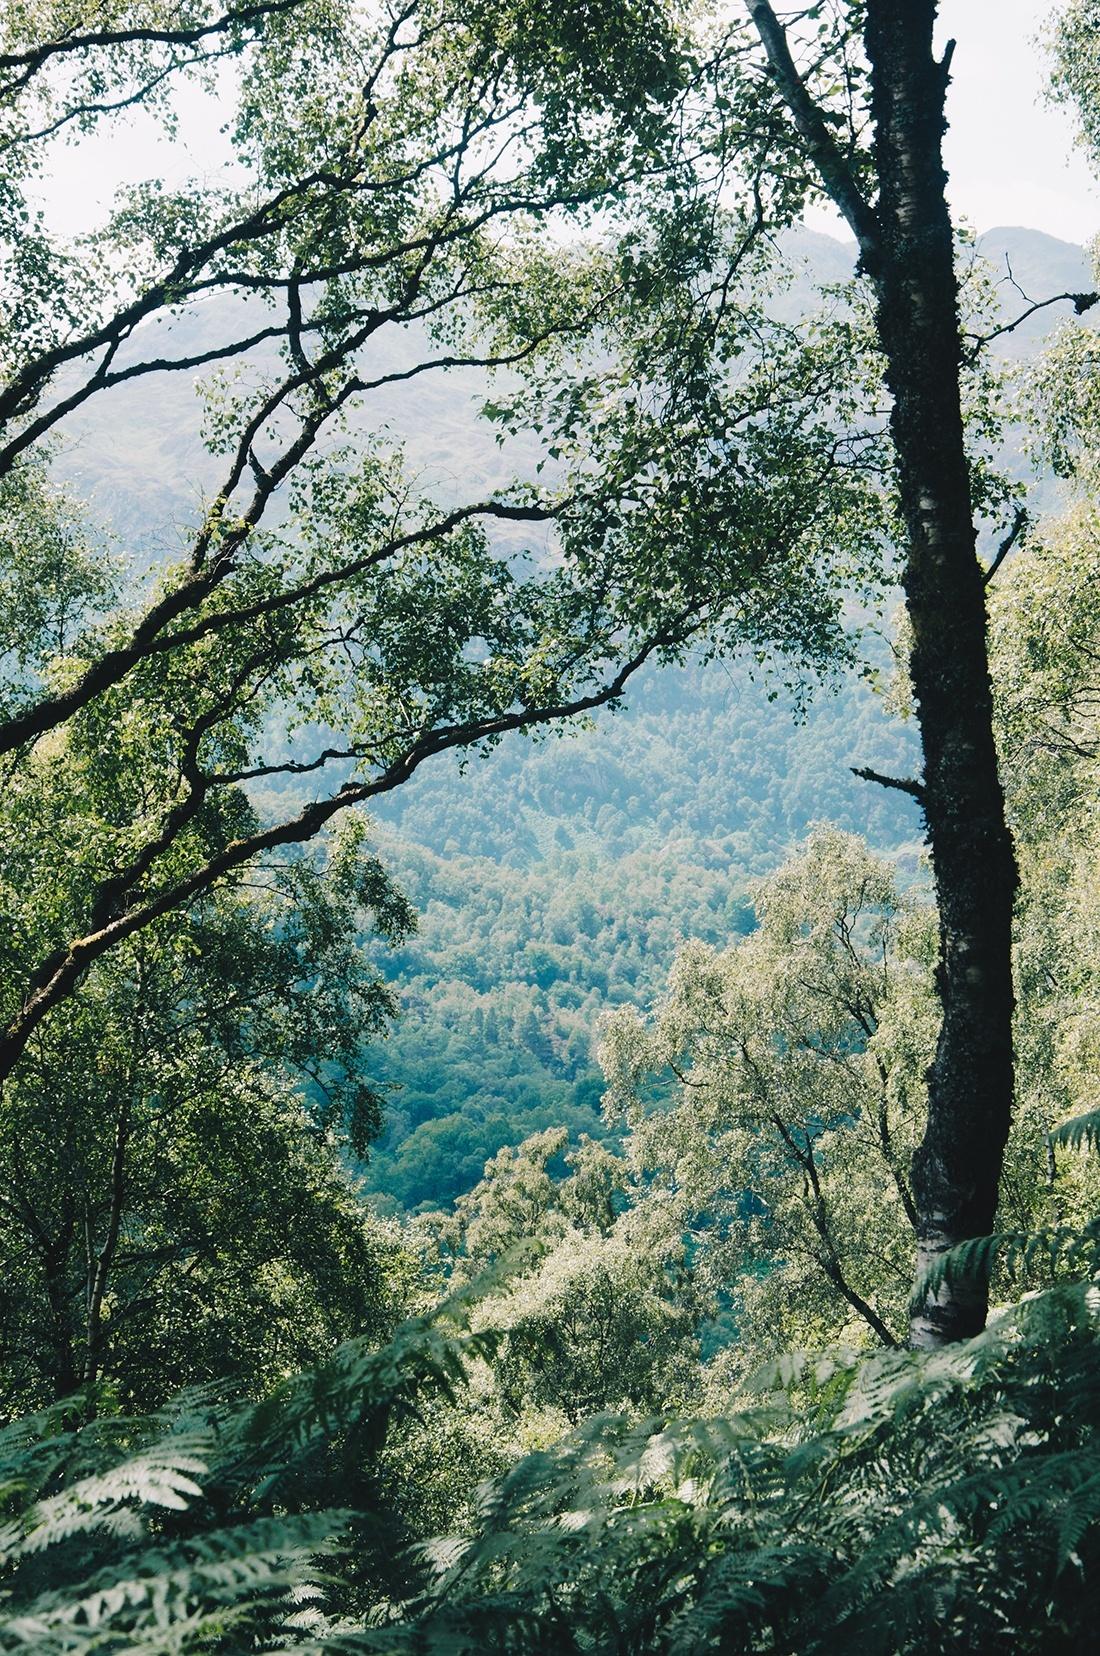 randonnée ben a'an, loch katrine, ecosse